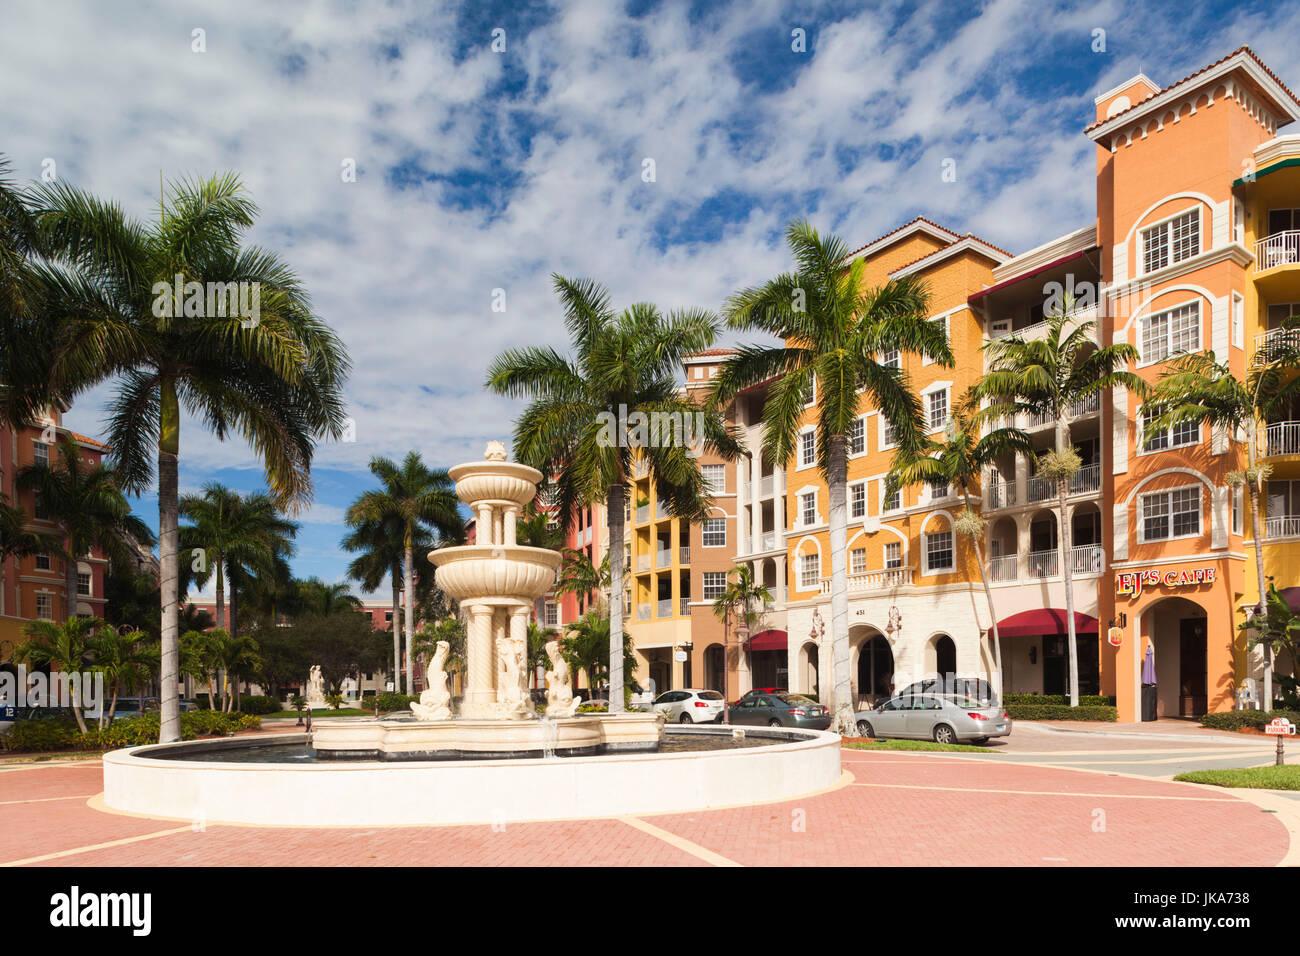 USA, Florida, Gulf Coast, Naples, Bayfront - Stock Image